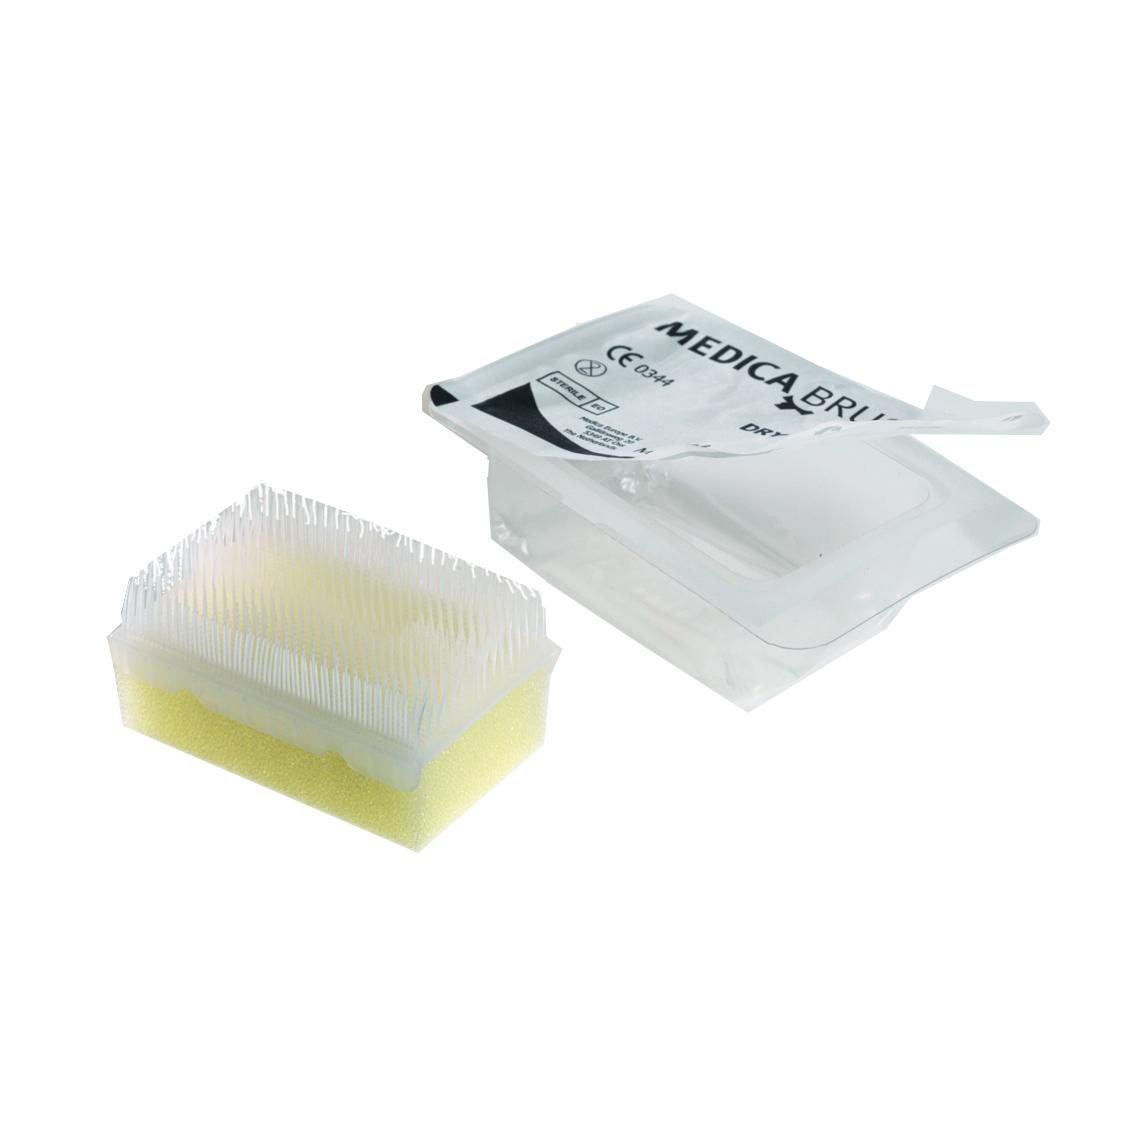 Medica Scrub Brushes Image